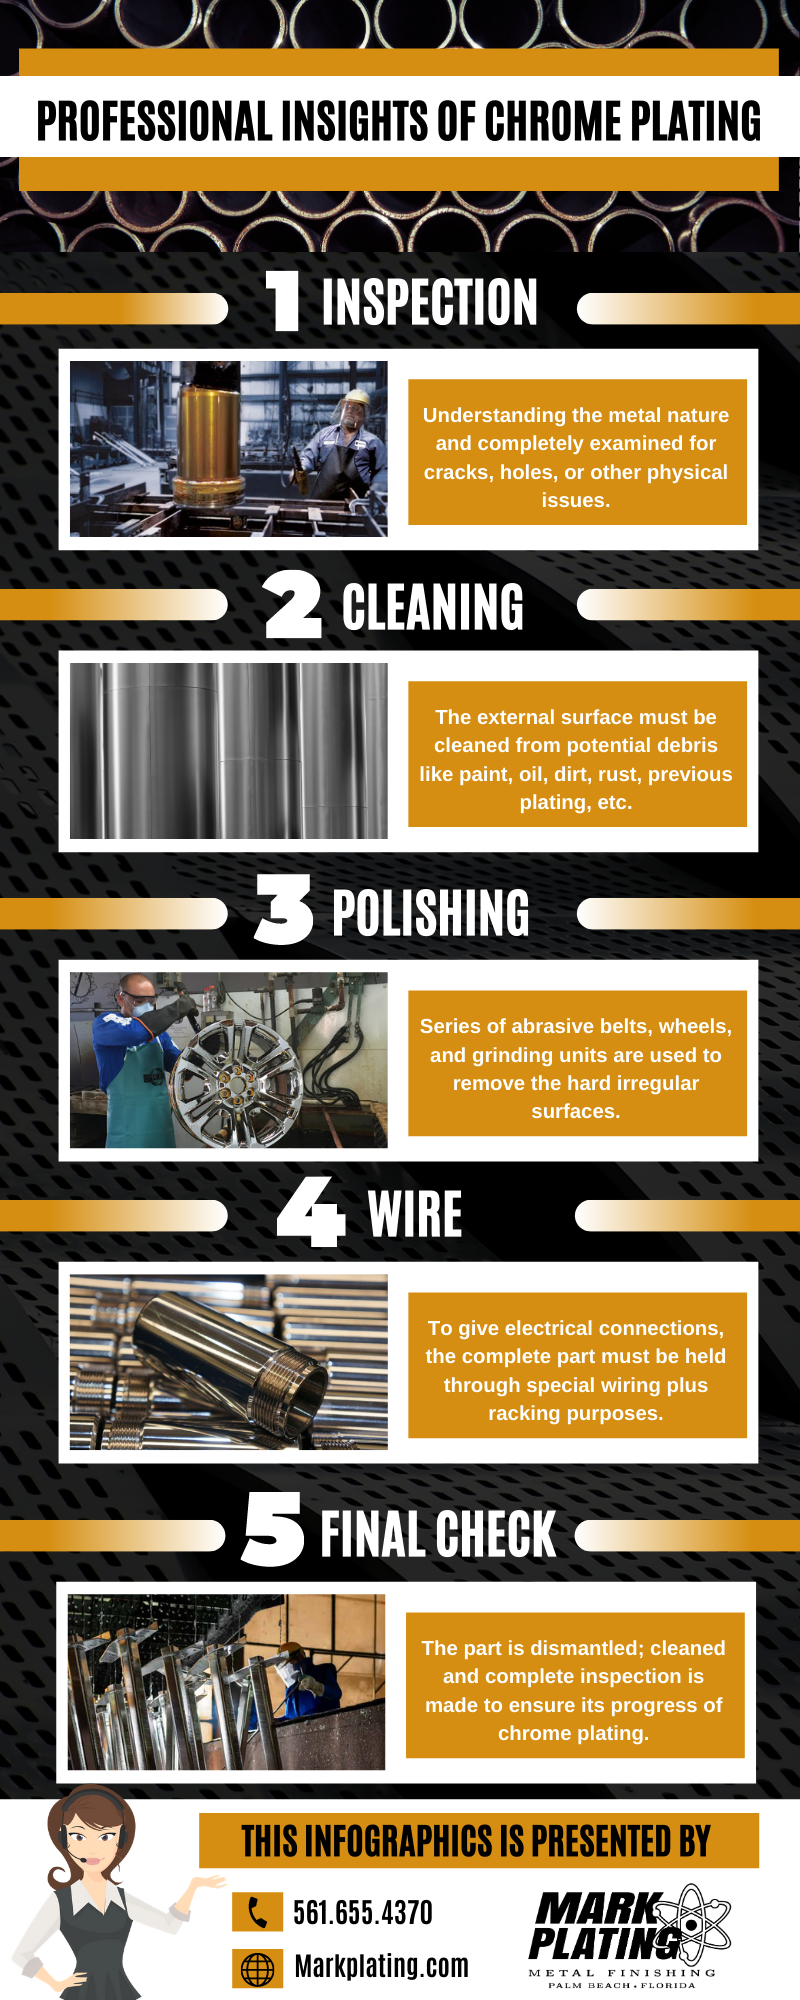 Premium Metal Finishing Services